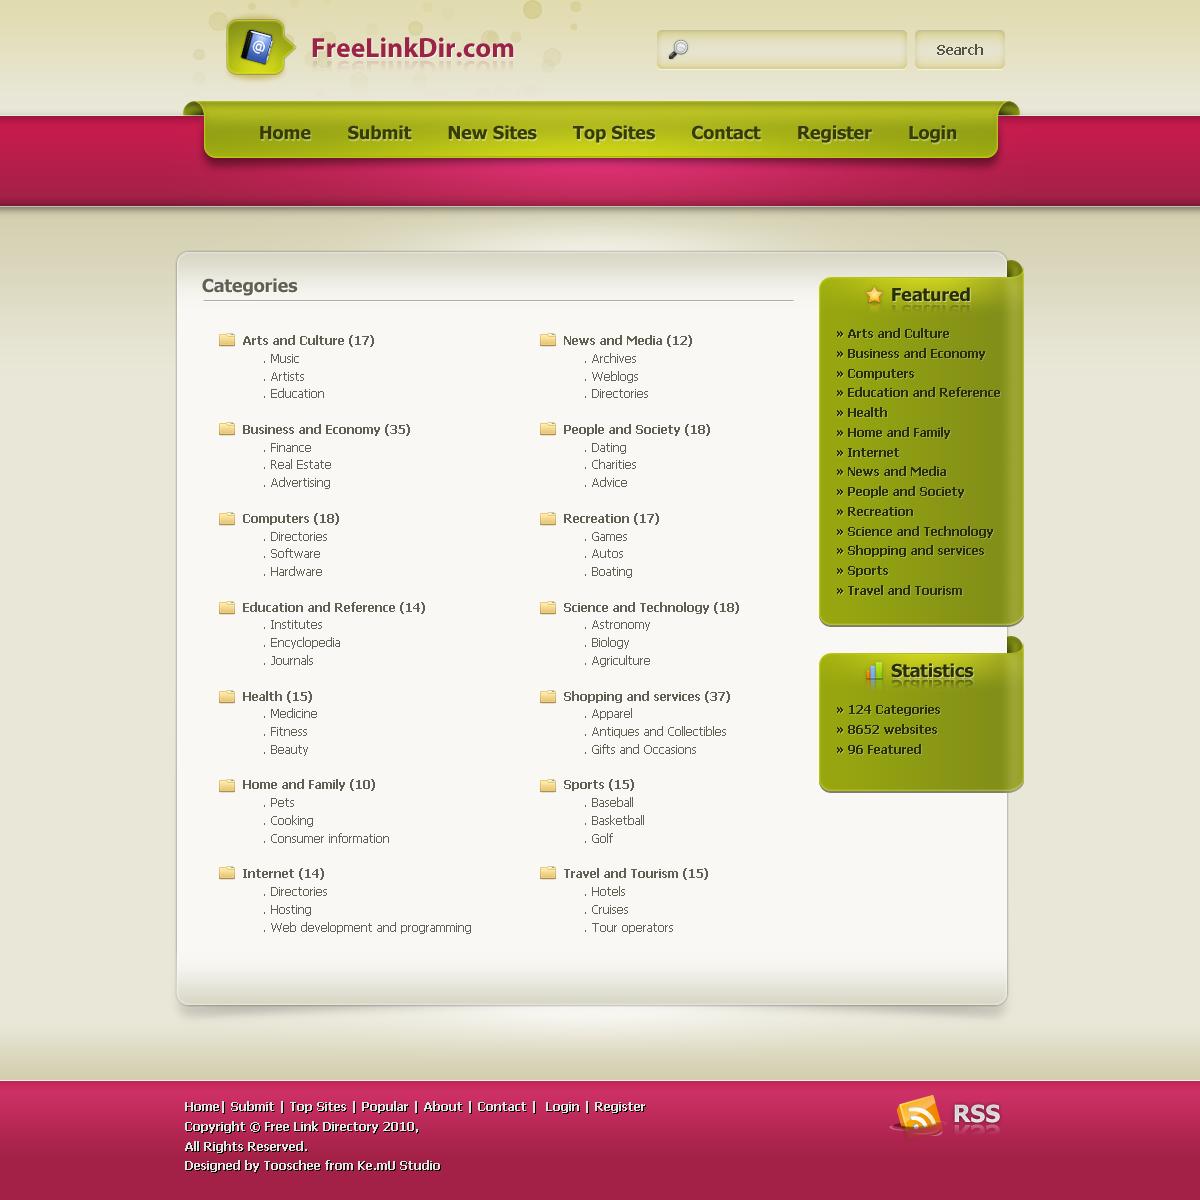 Freelinkdir.com Redesign